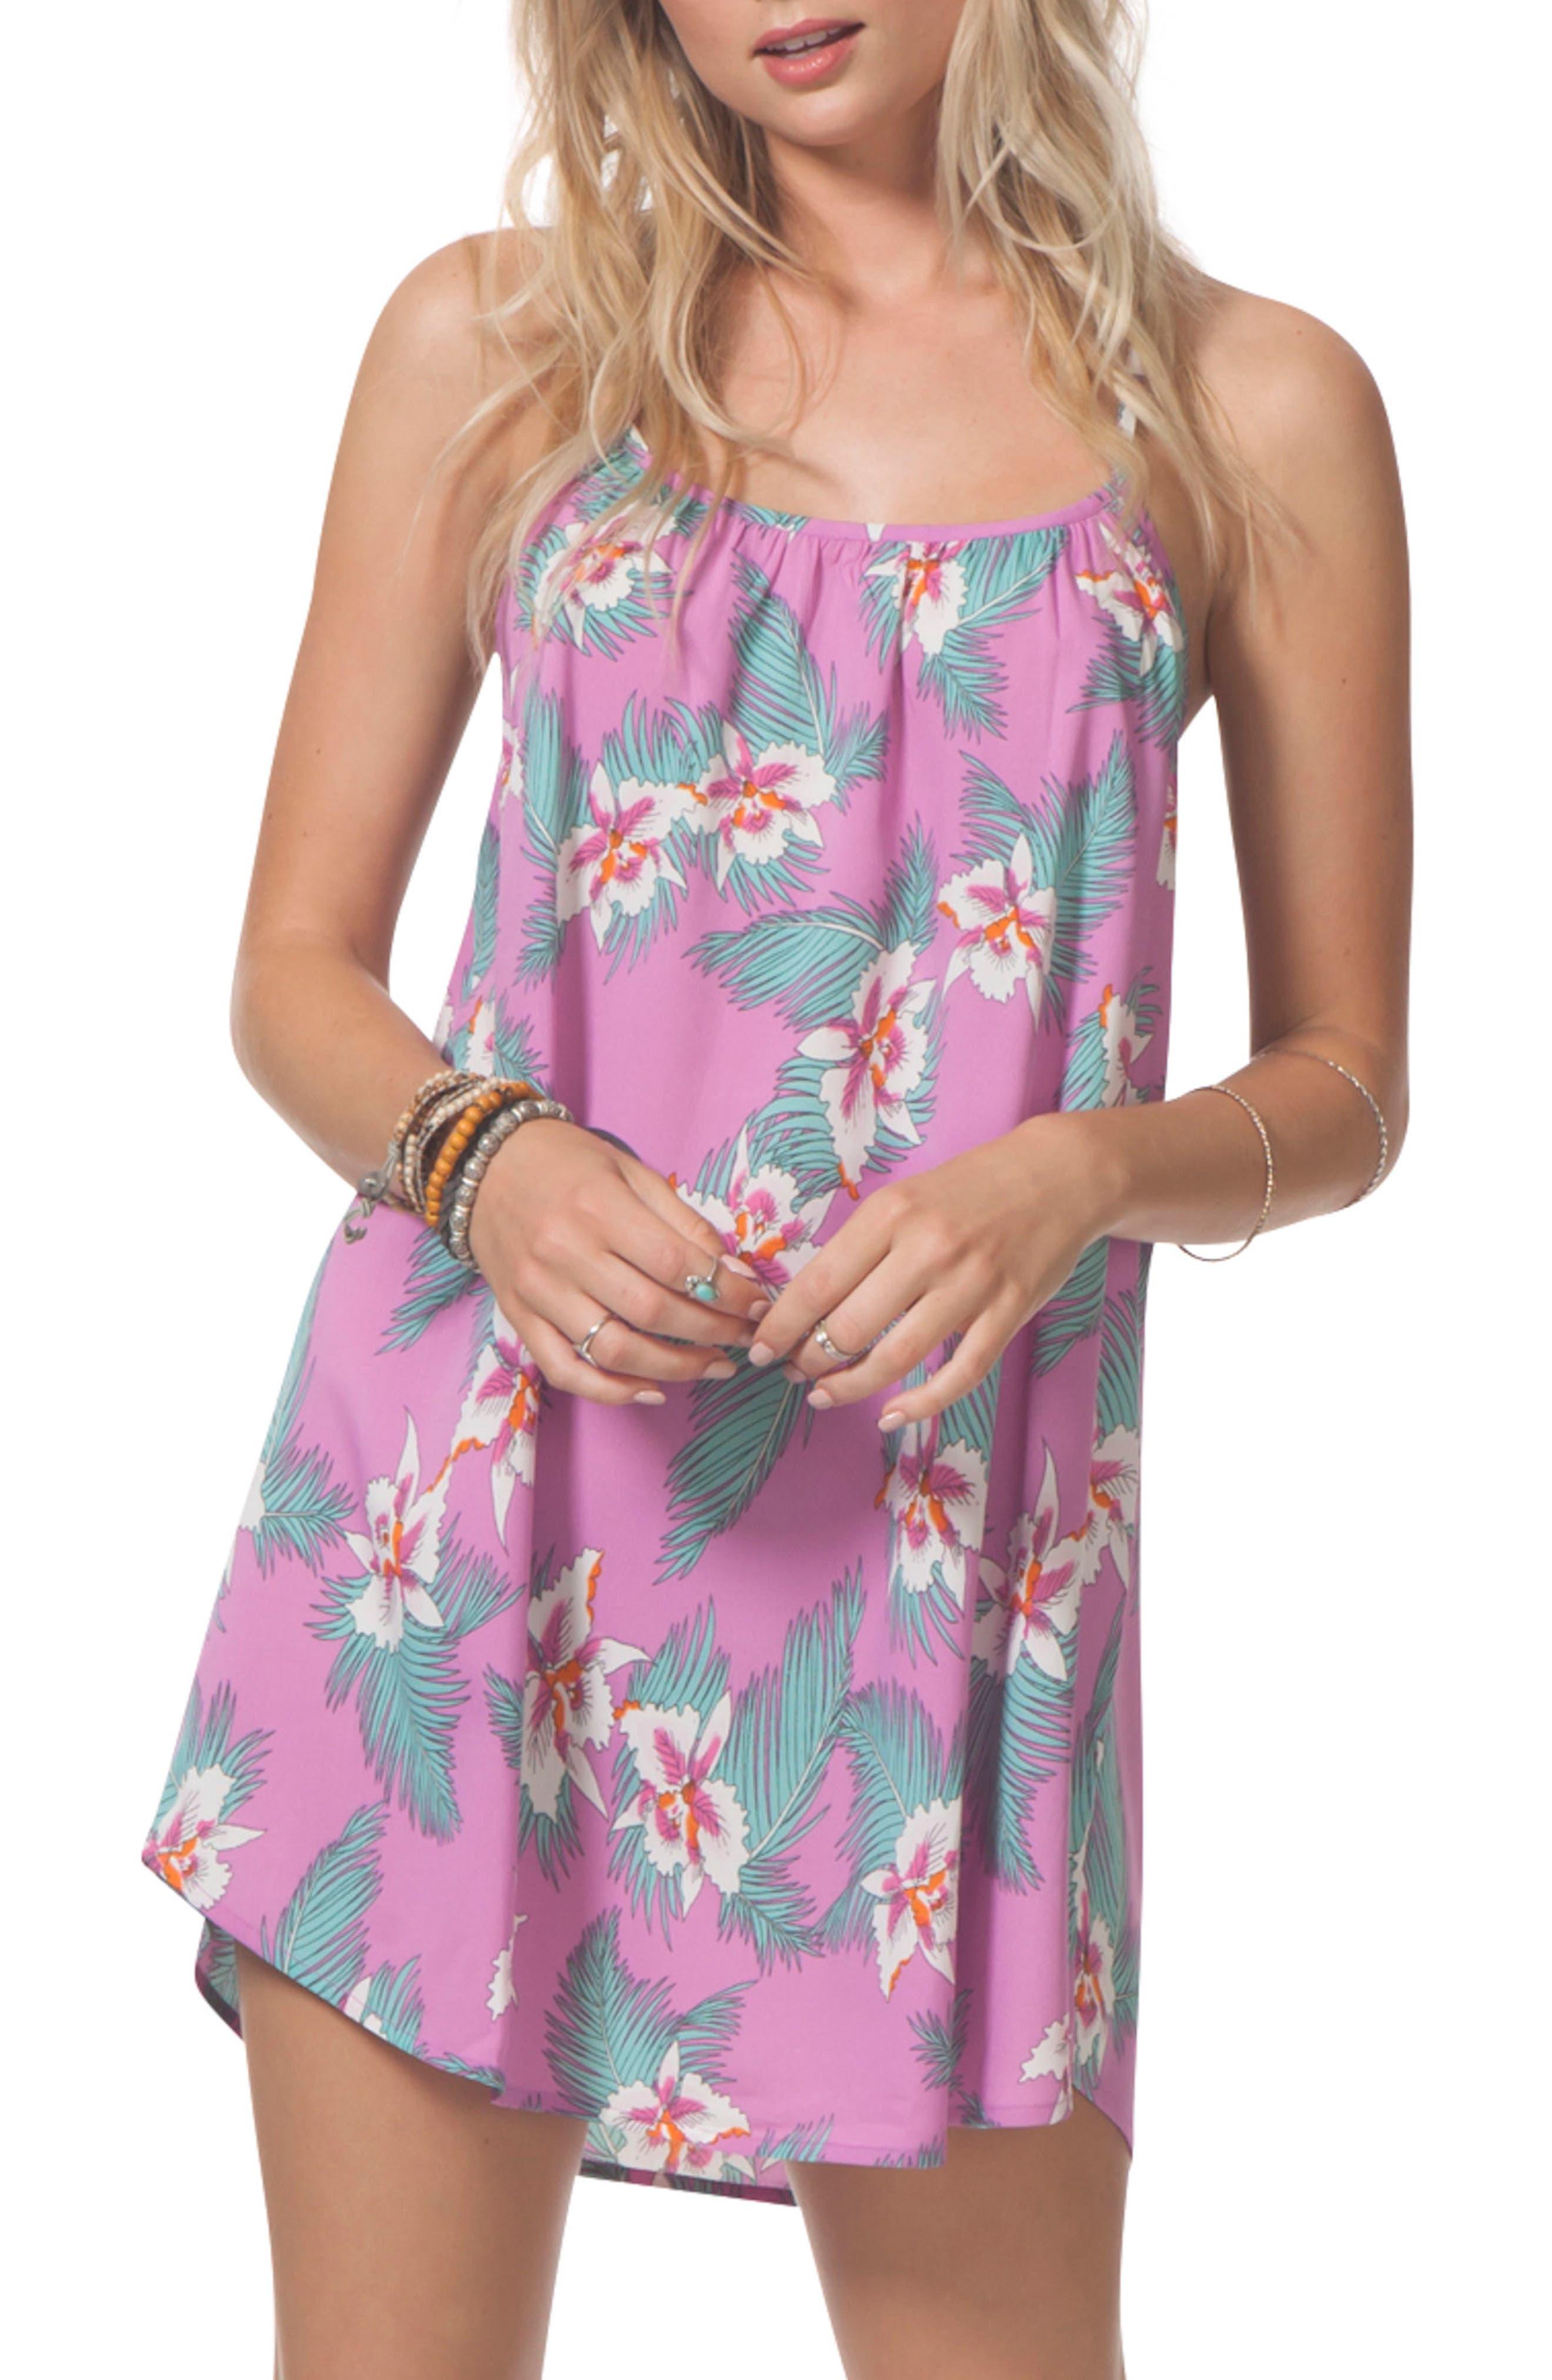 Hot Shot Floral Cover-Up Dress,                             Main thumbnail 1, color,                             500